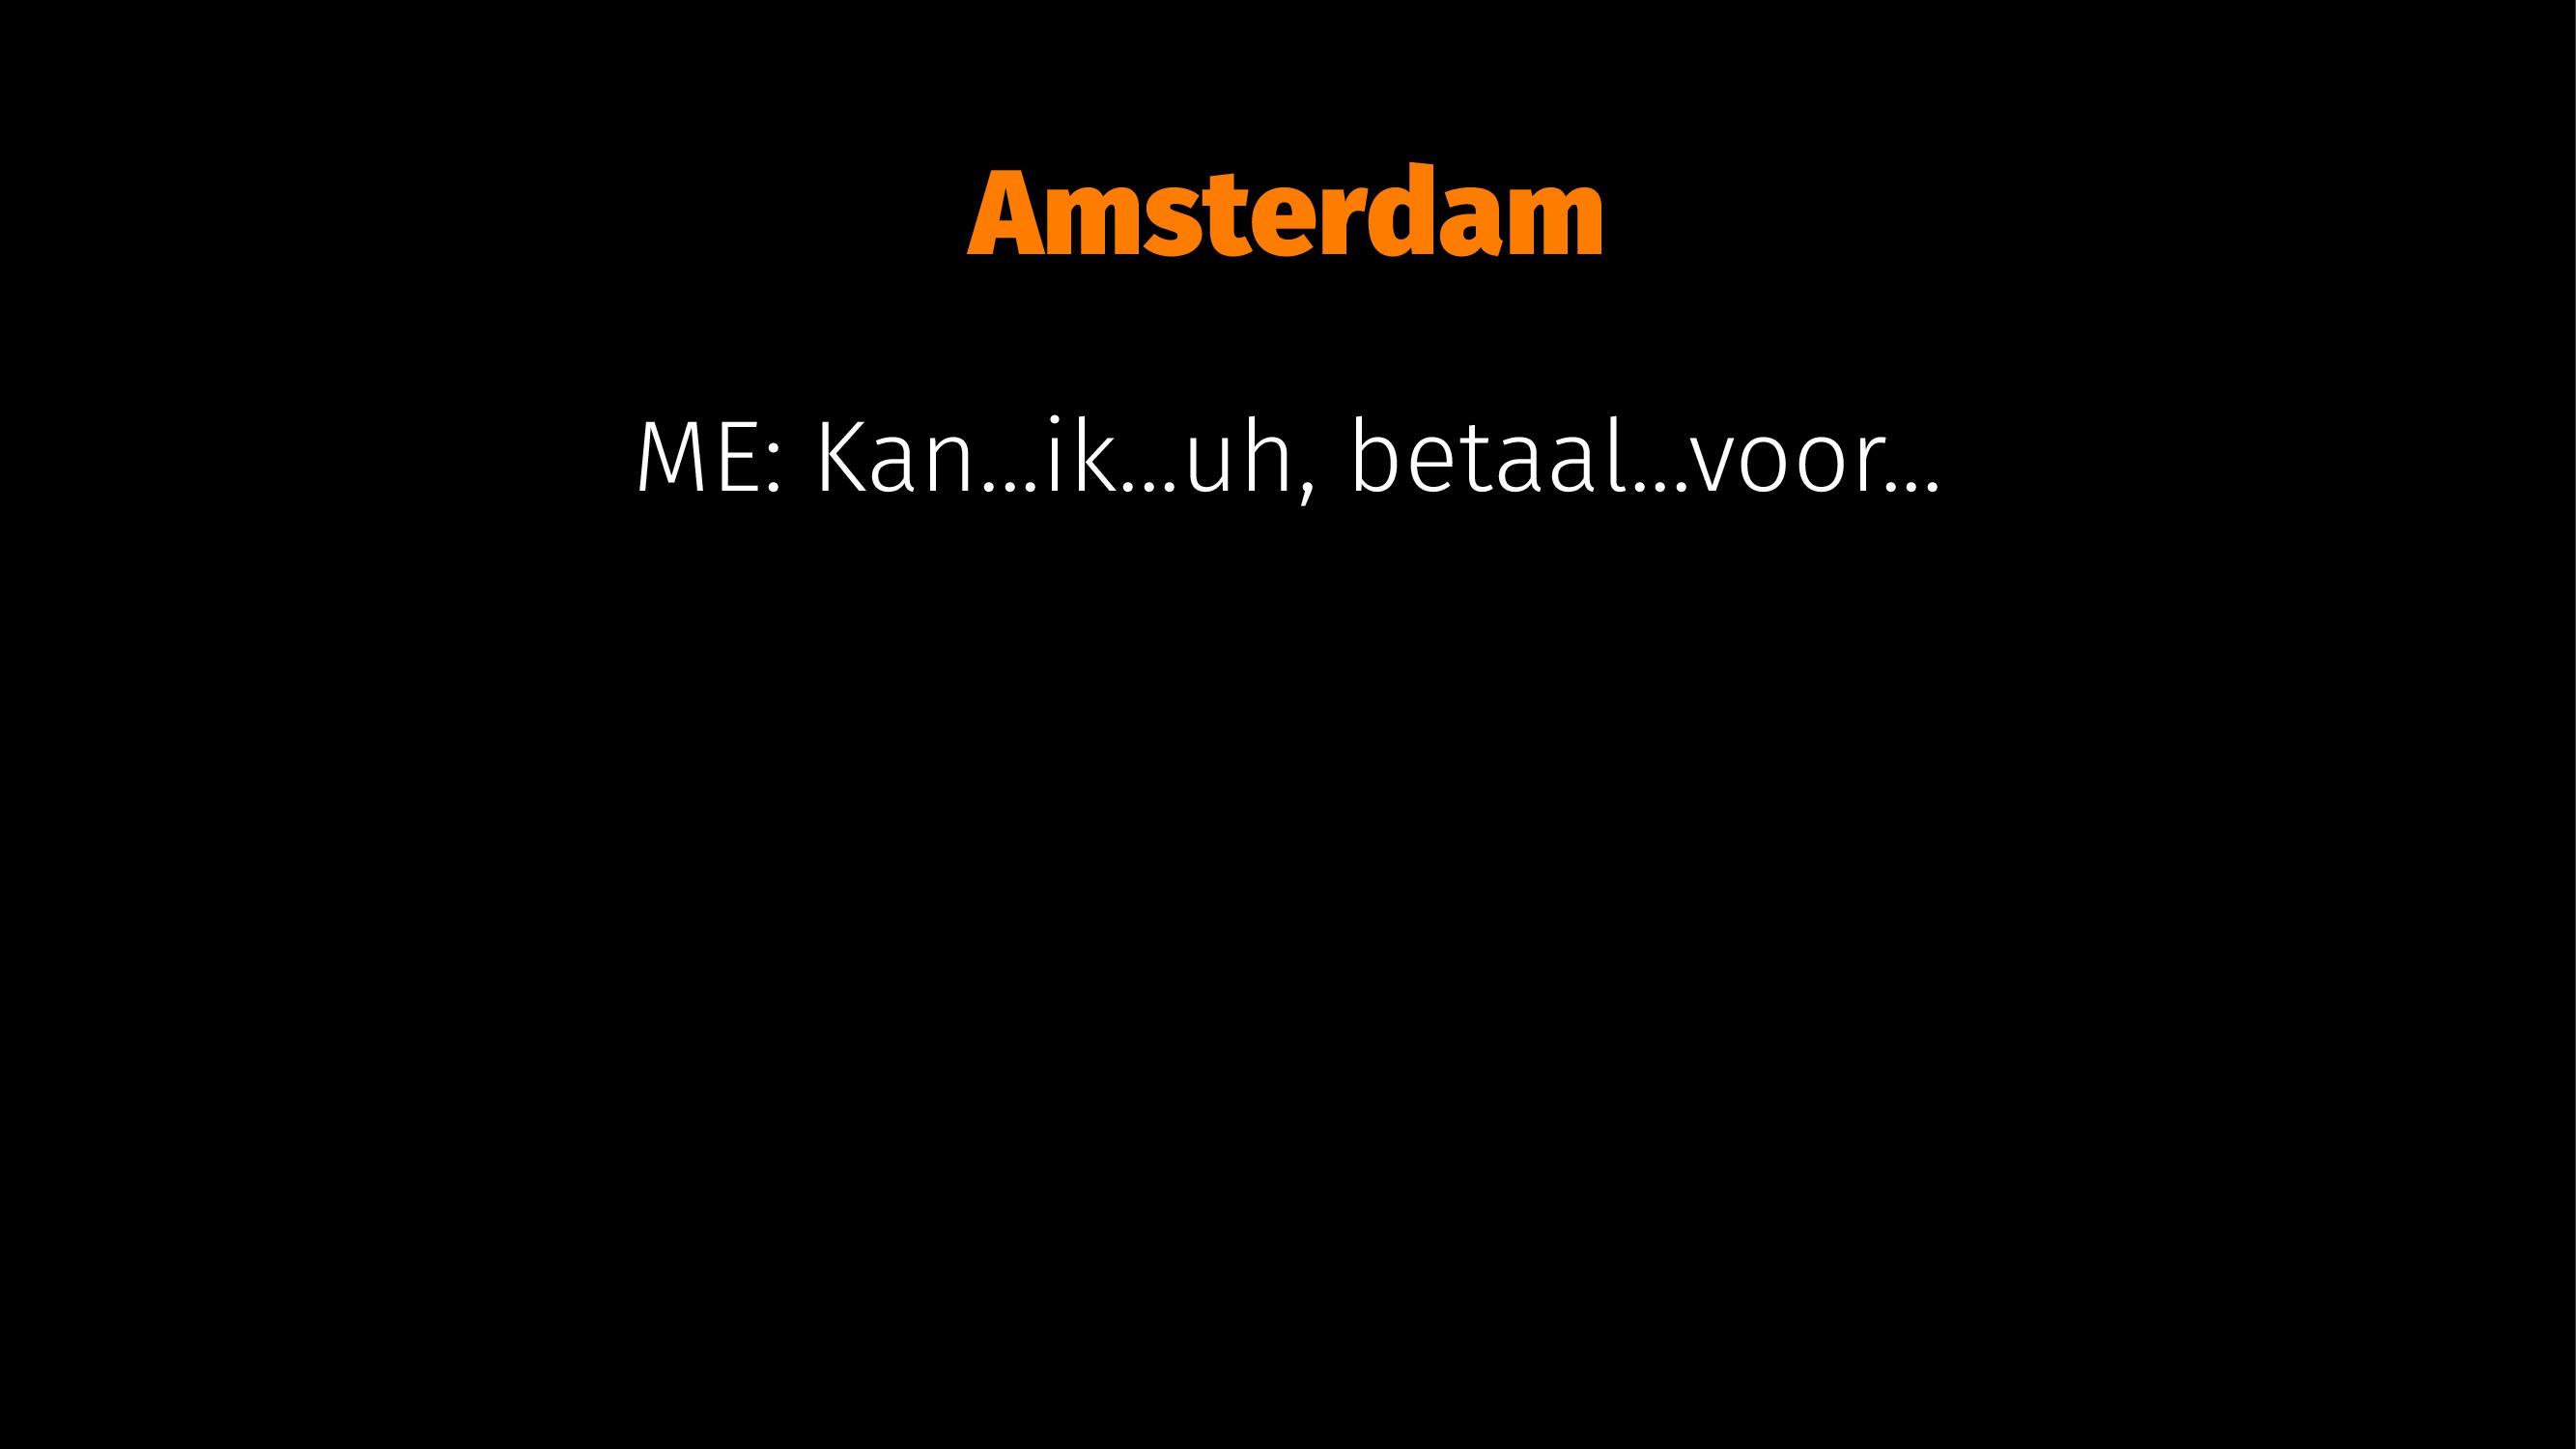 Amsterdam ME: Kan...ik...uh, betaal...voor...